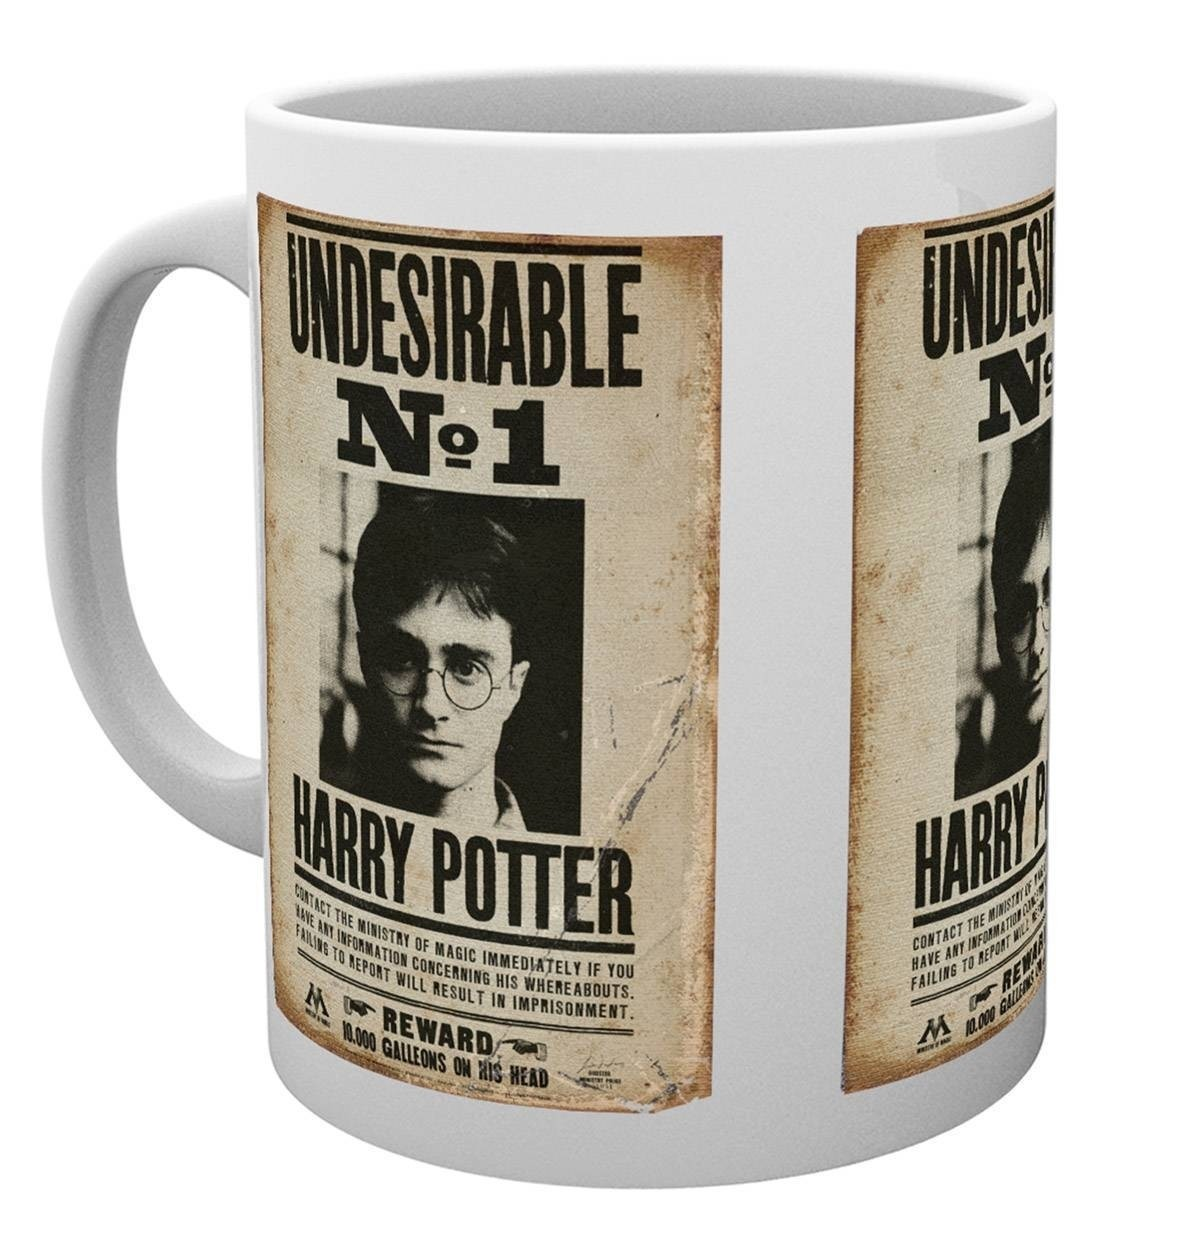 Harry Potter - Mug 300 ml - UNDESIRABLE No 1